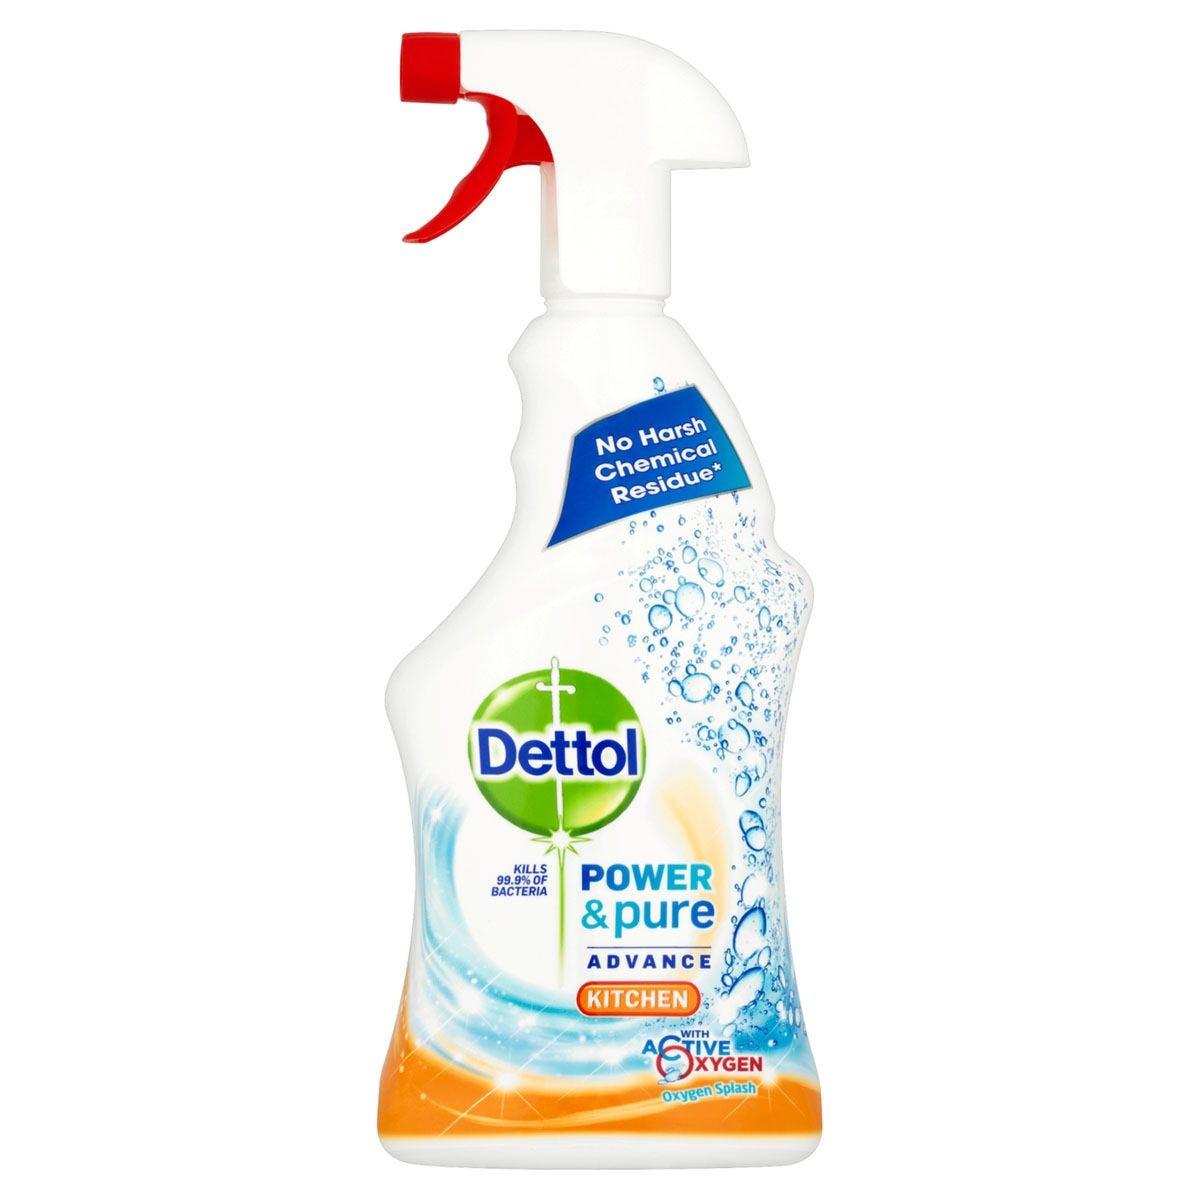 Dettol Power & Pure Antibacterial Kitchen Spray - 750ml